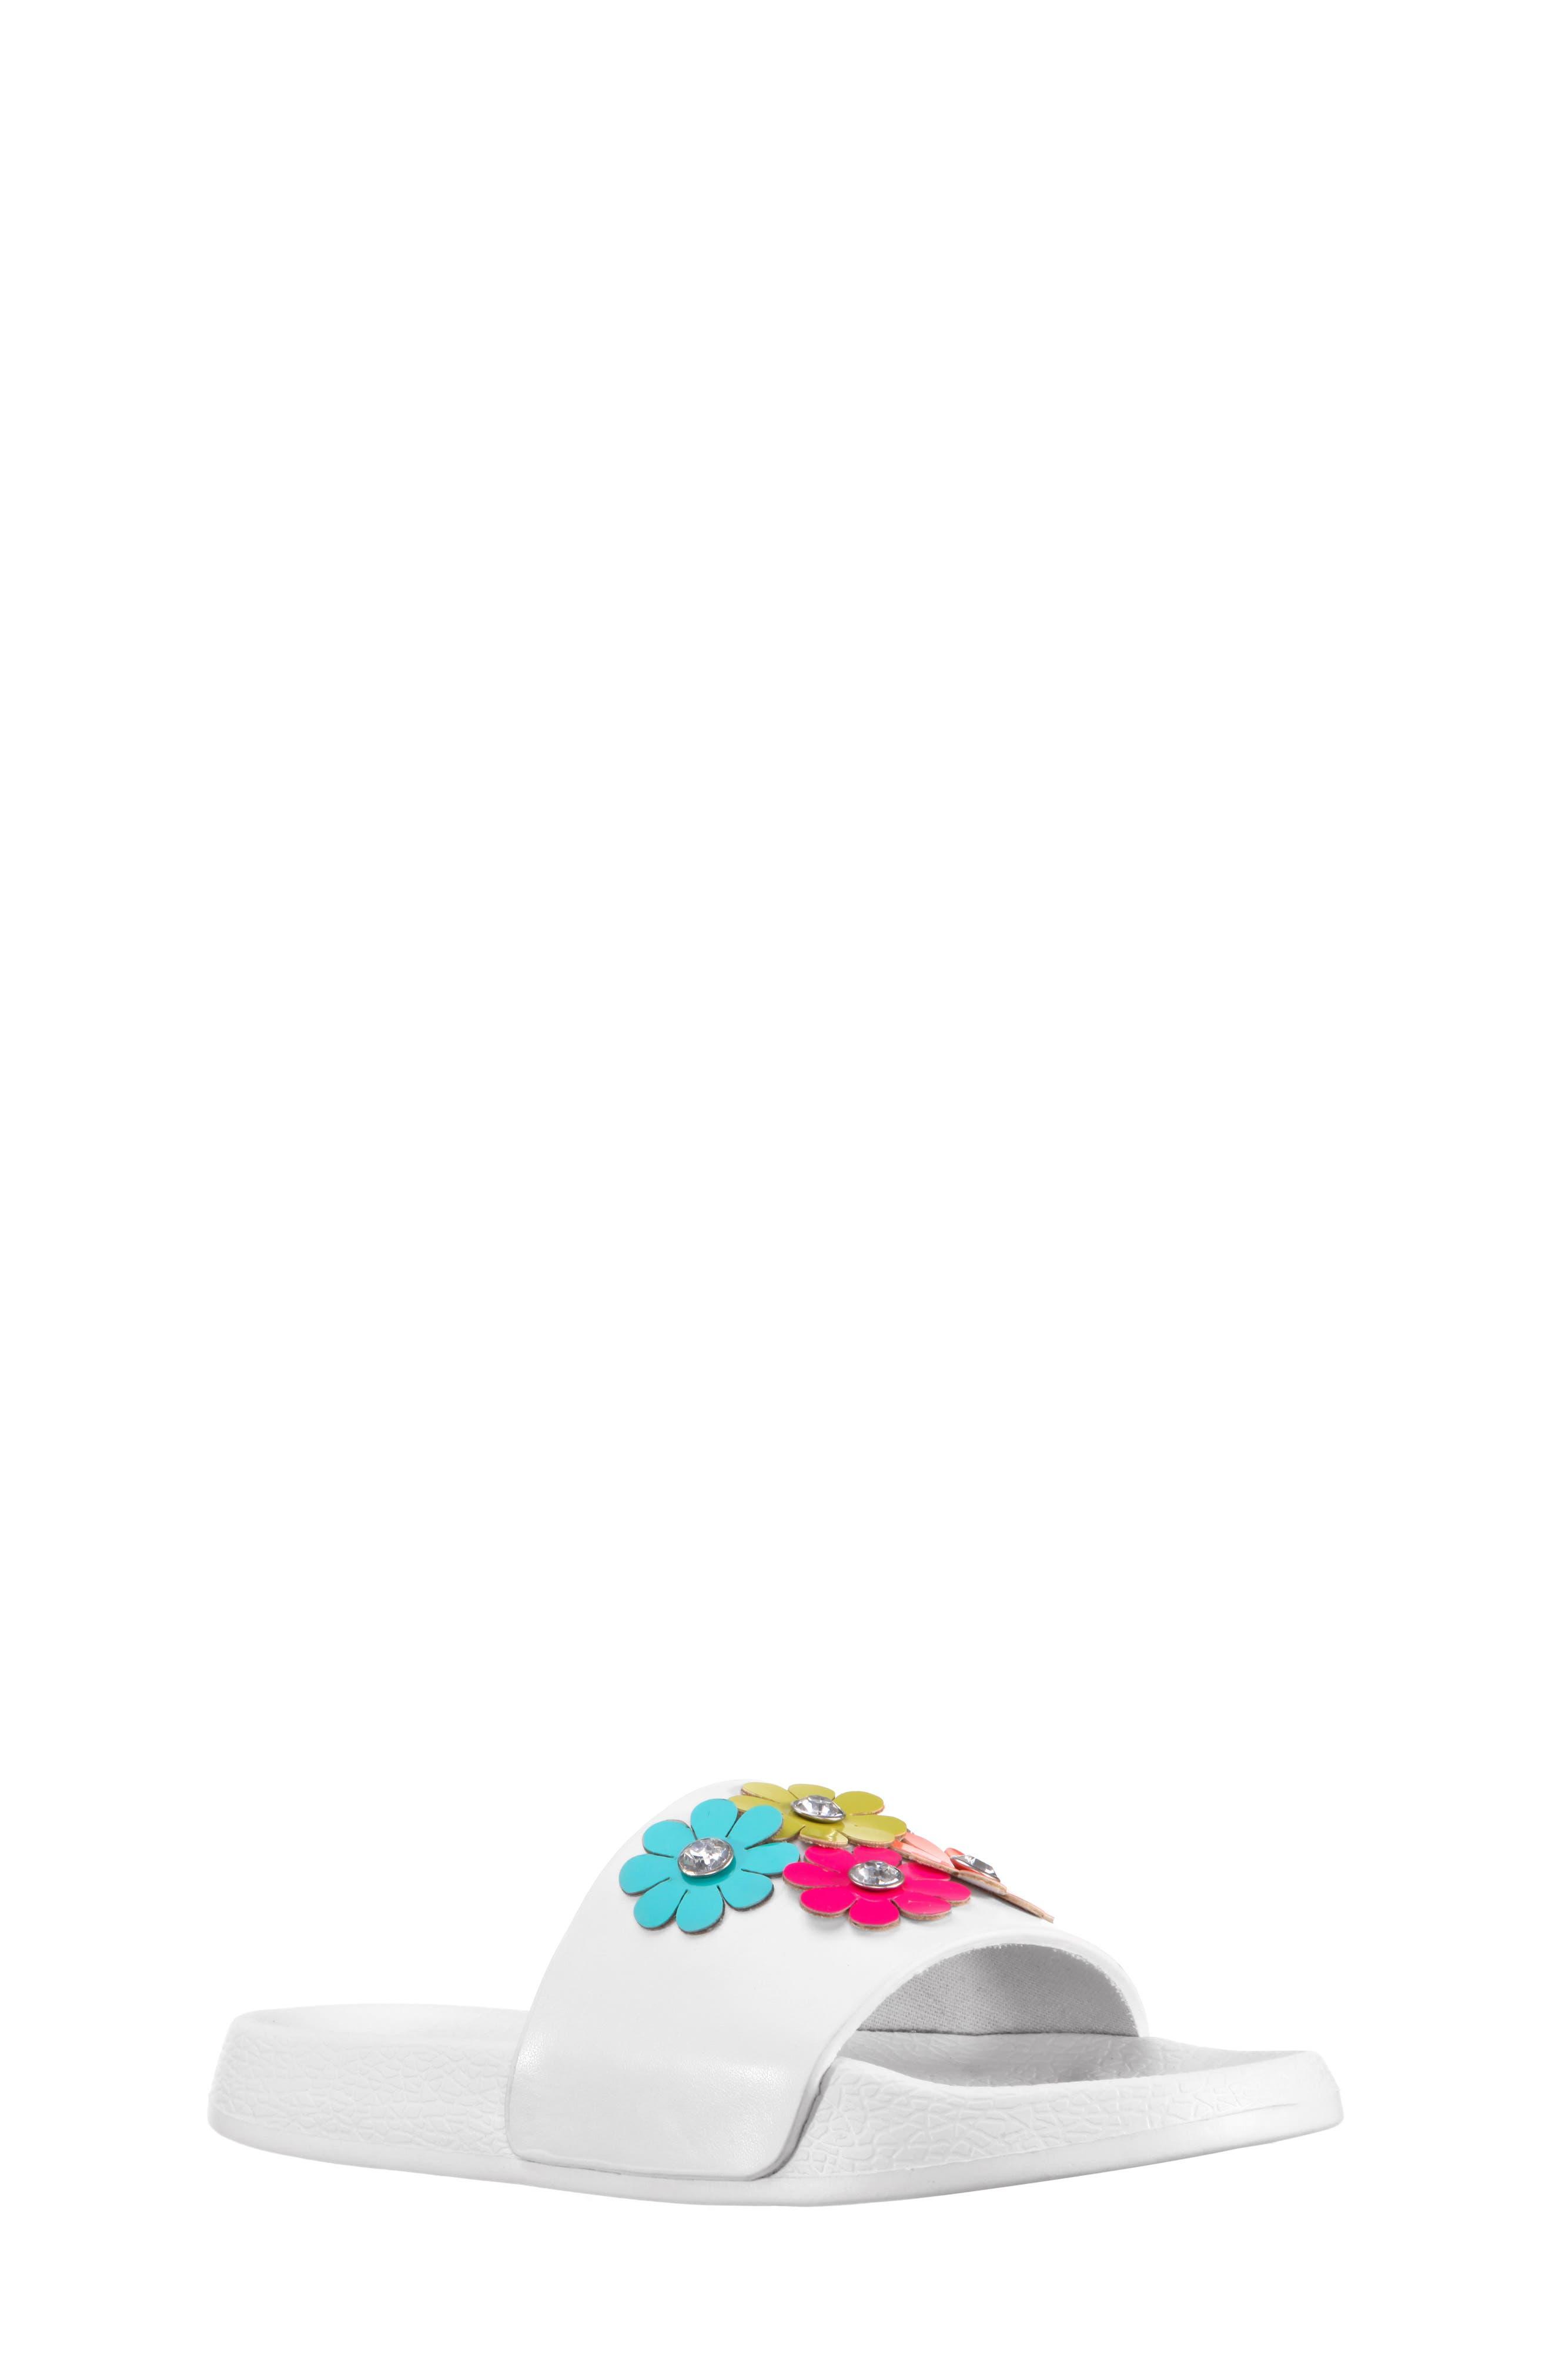 Flowermaid Embellished Slide Sandal,                             Main thumbnail 1, color,                             White Smooth